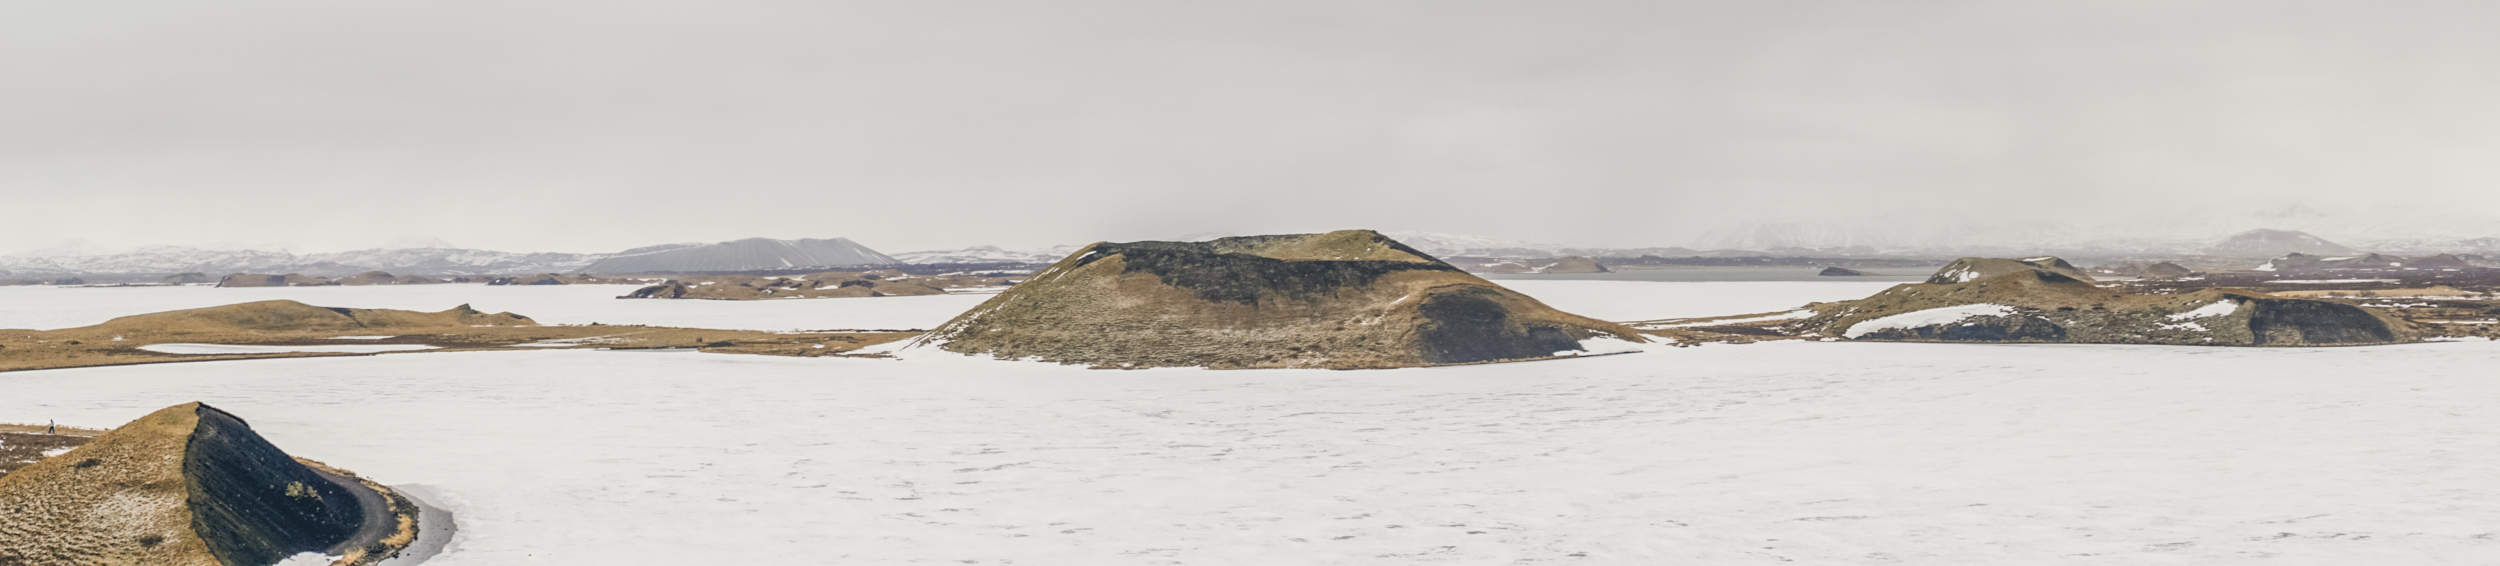 1803_Iceland-61.jpg